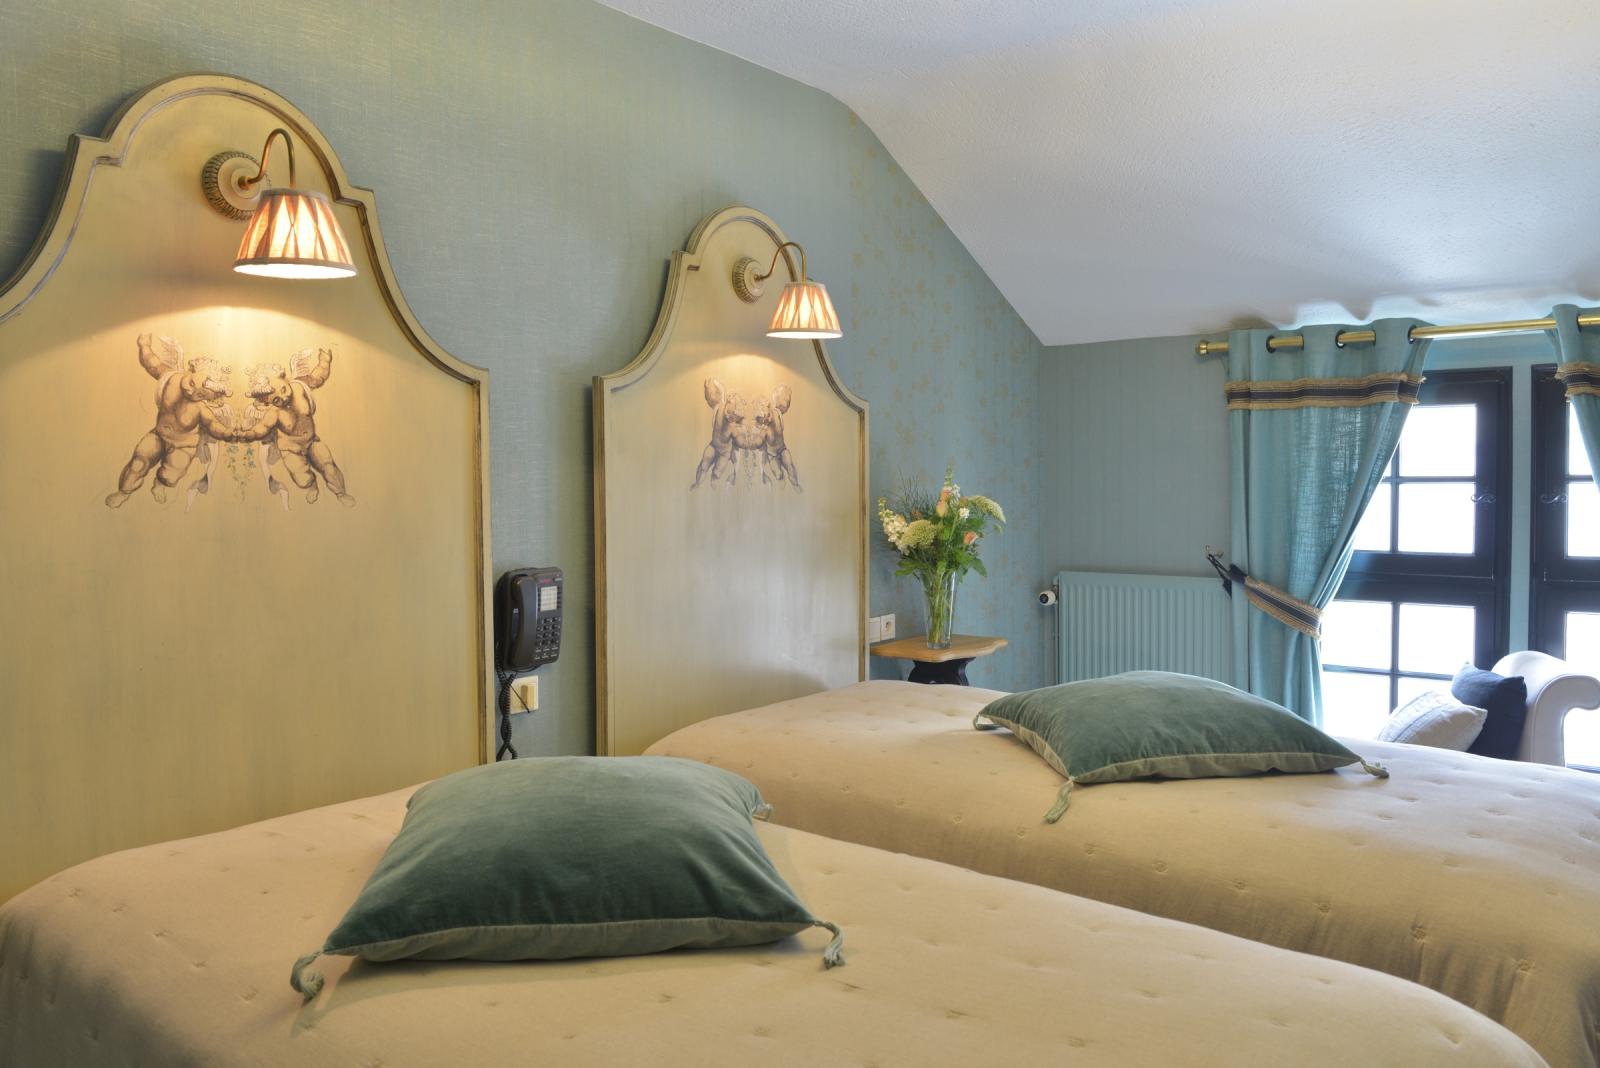 elegance room h tel saint pierre 4 toiles saumur france. Black Bedroom Furniture Sets. Home Design Ideas